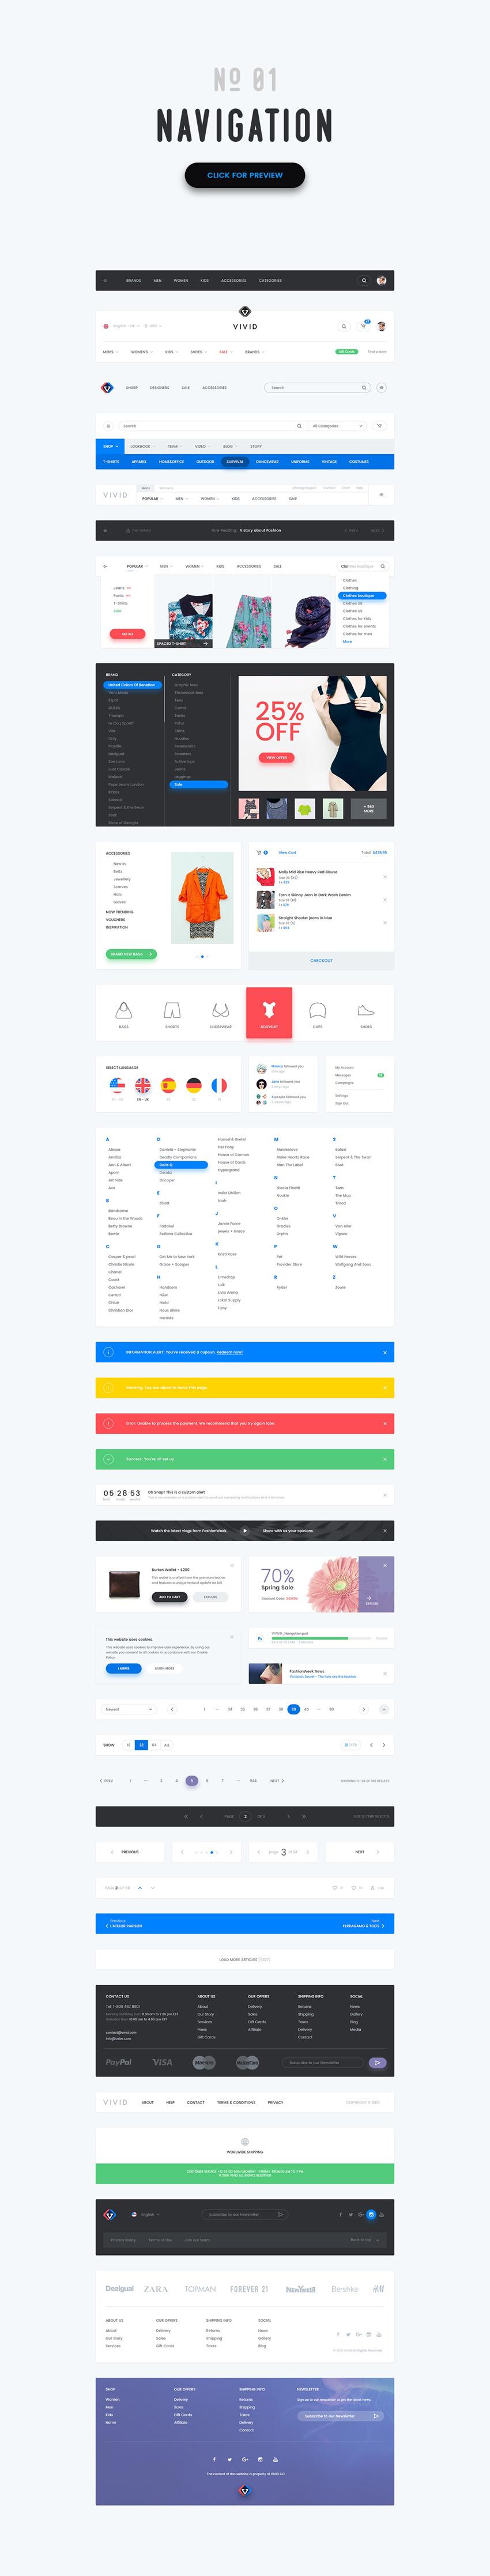 万用网页 UI designshidai_ui94